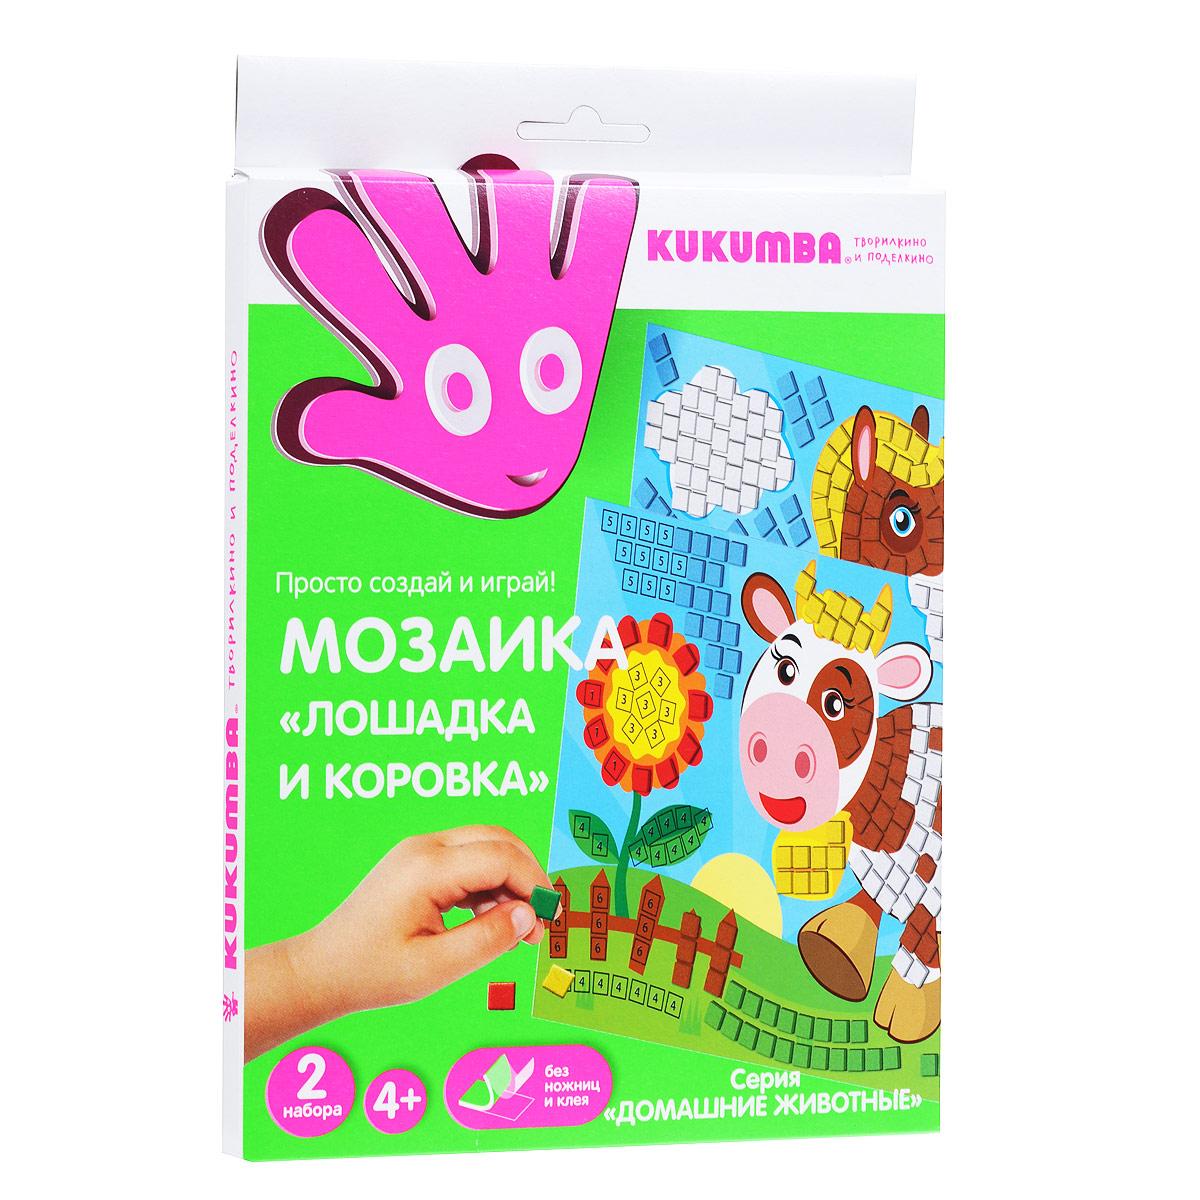 "Мозаика по номерам Kukumba ""Лошадка и коровка"" 97019"